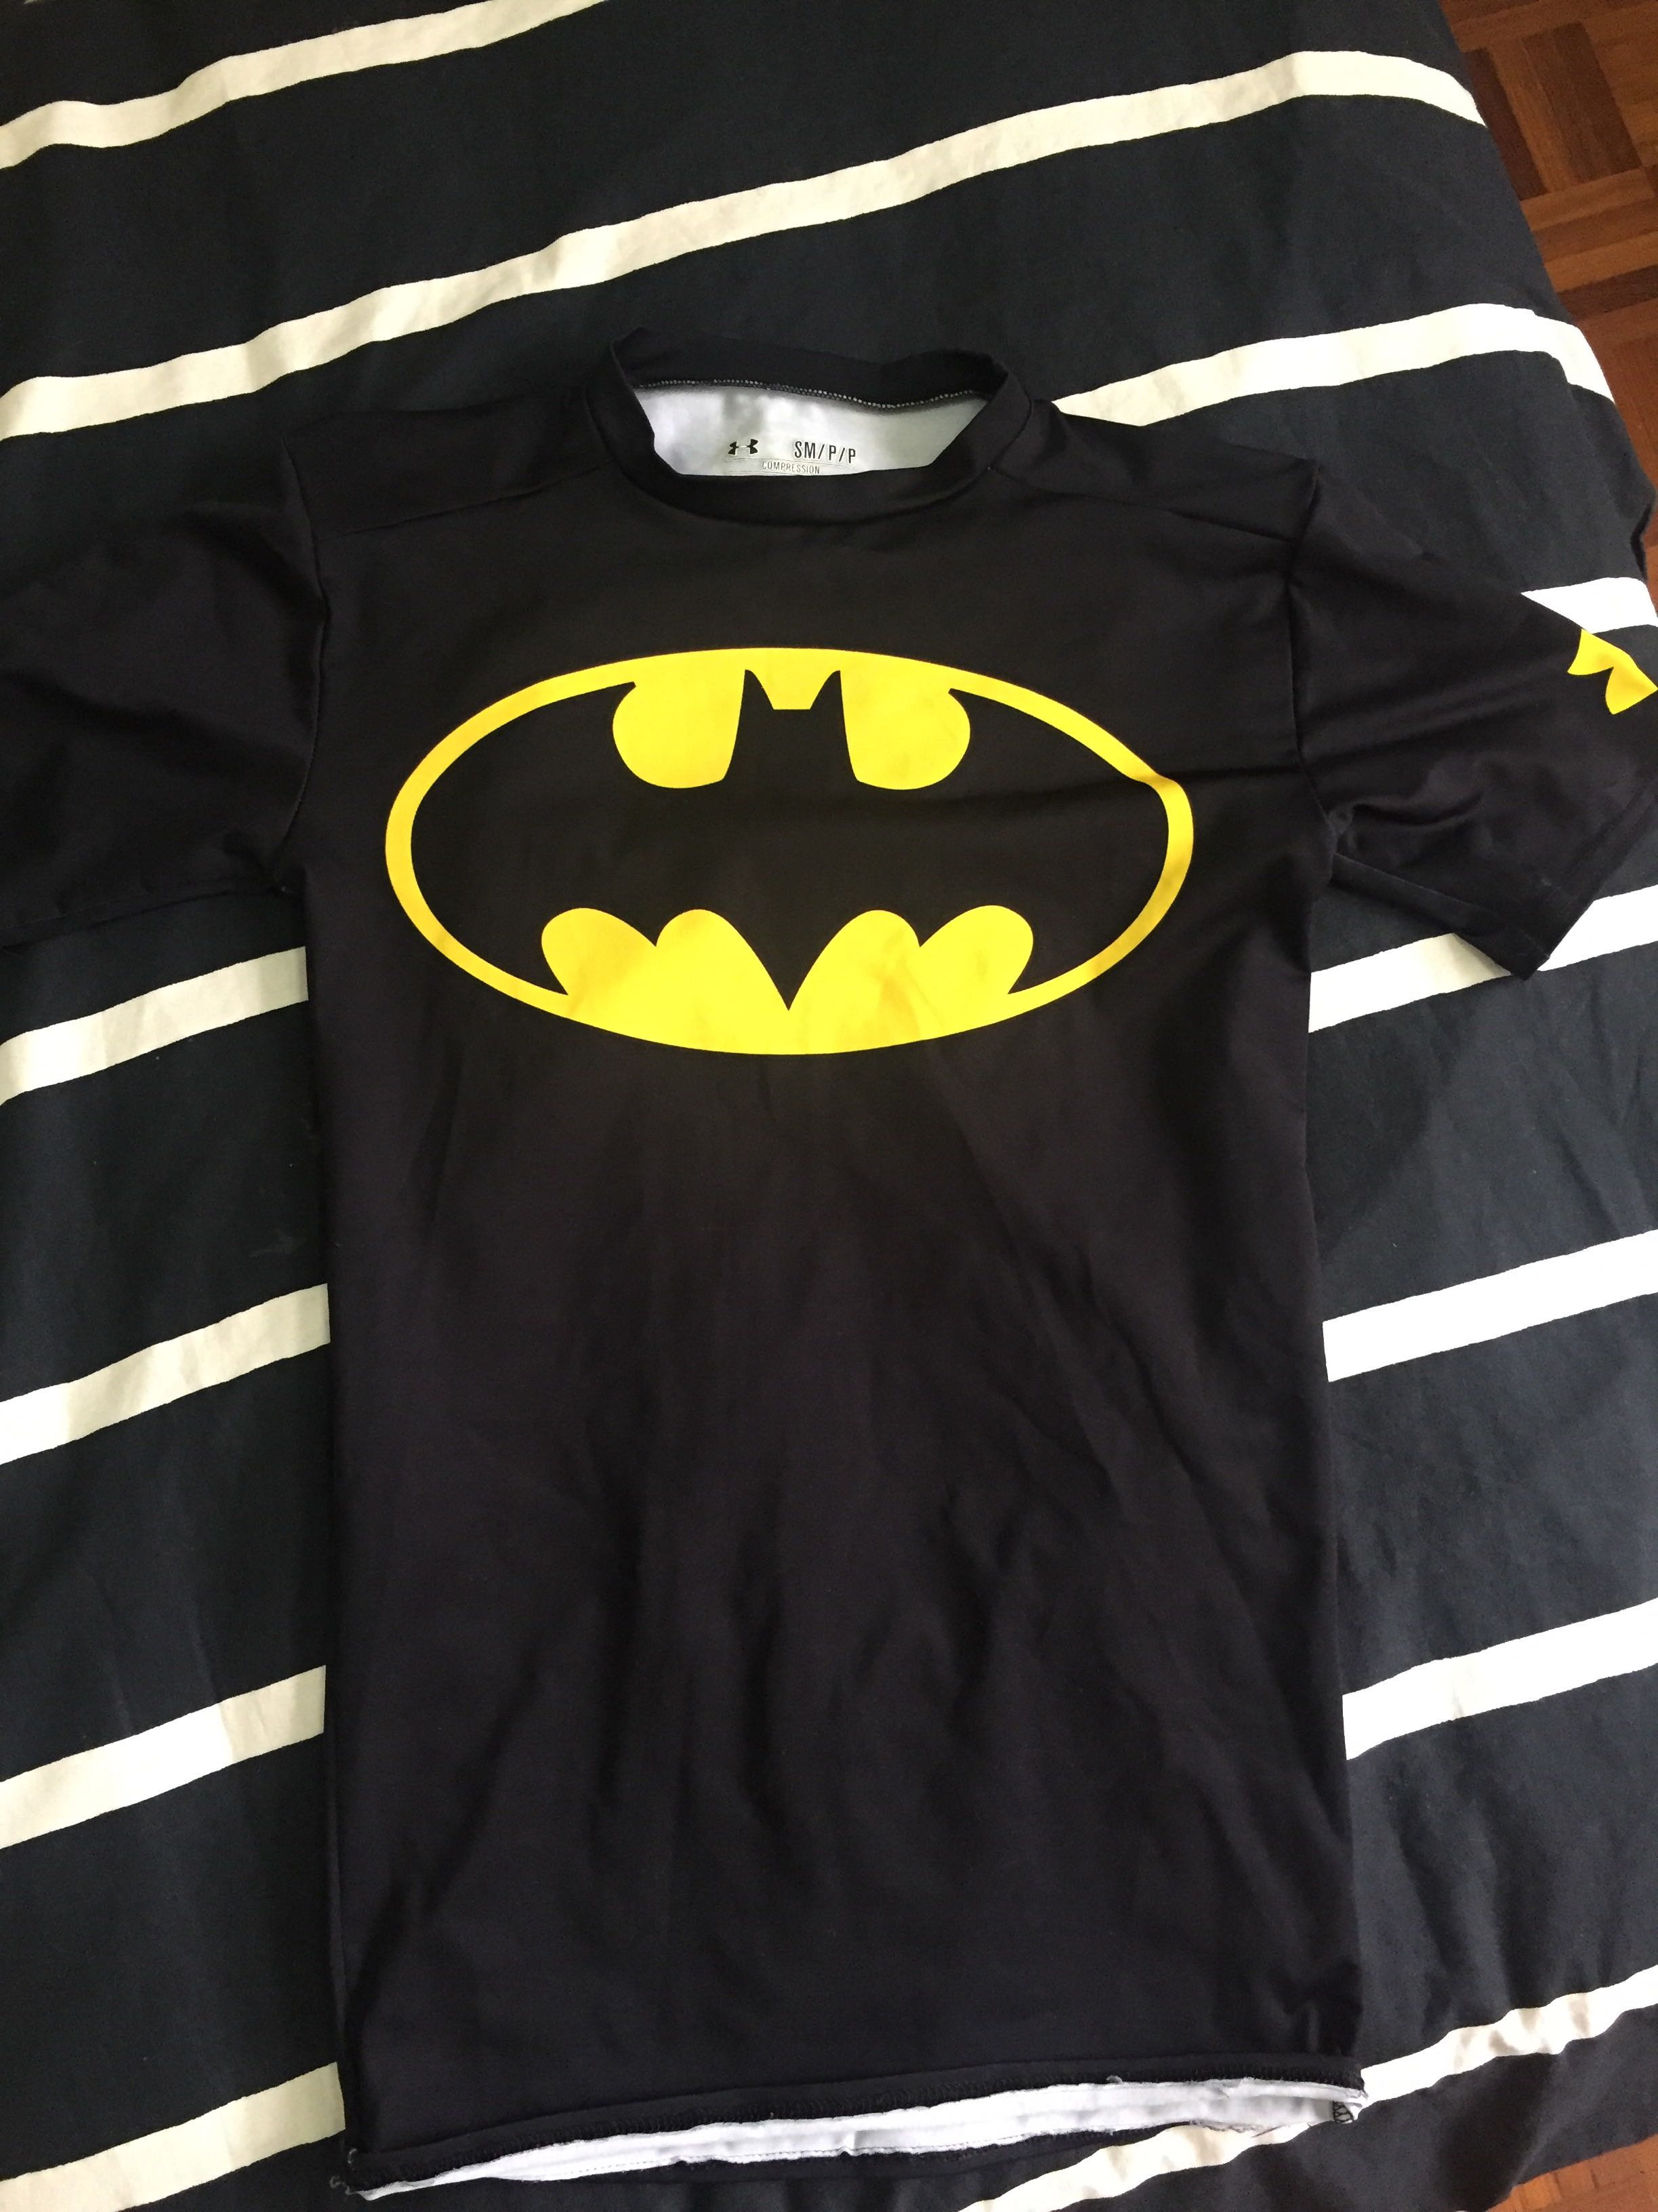 eed2ec69747cc Batman under armour gym tight shirt, Sports, Sports Apparel on Carousell